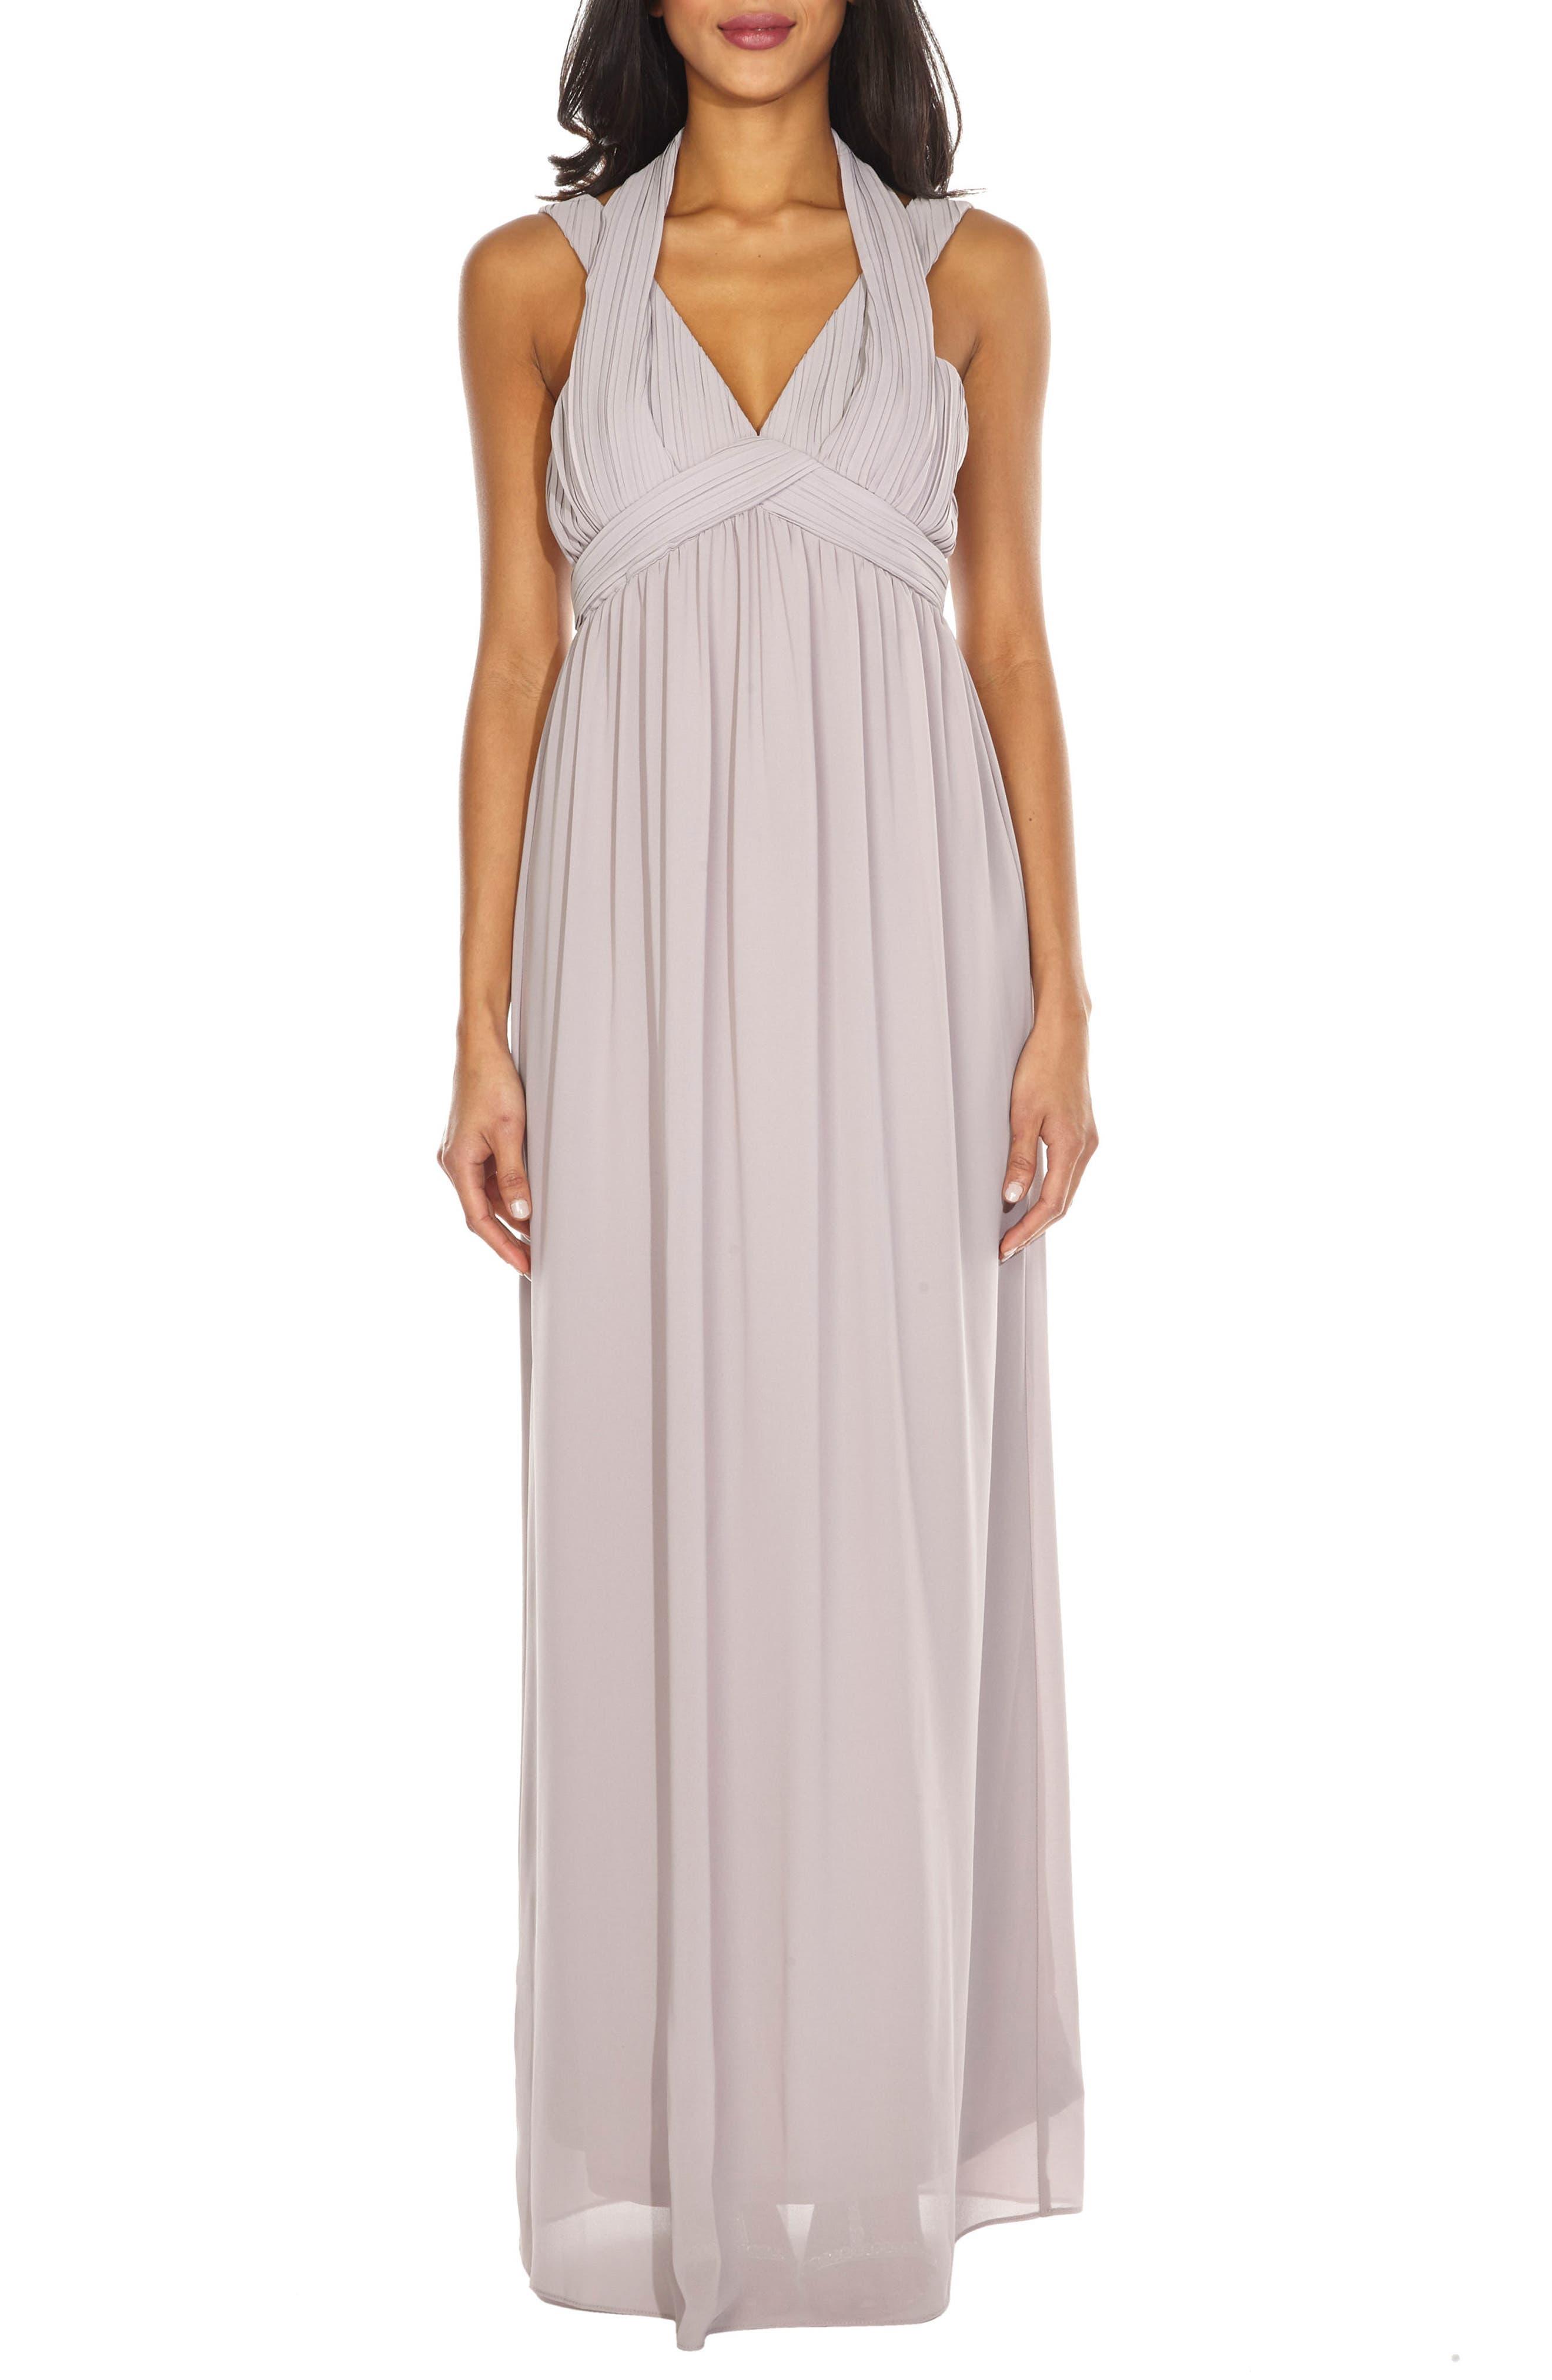 Arley Chiffon Gown,                         Main,                         color, Lavender Fog